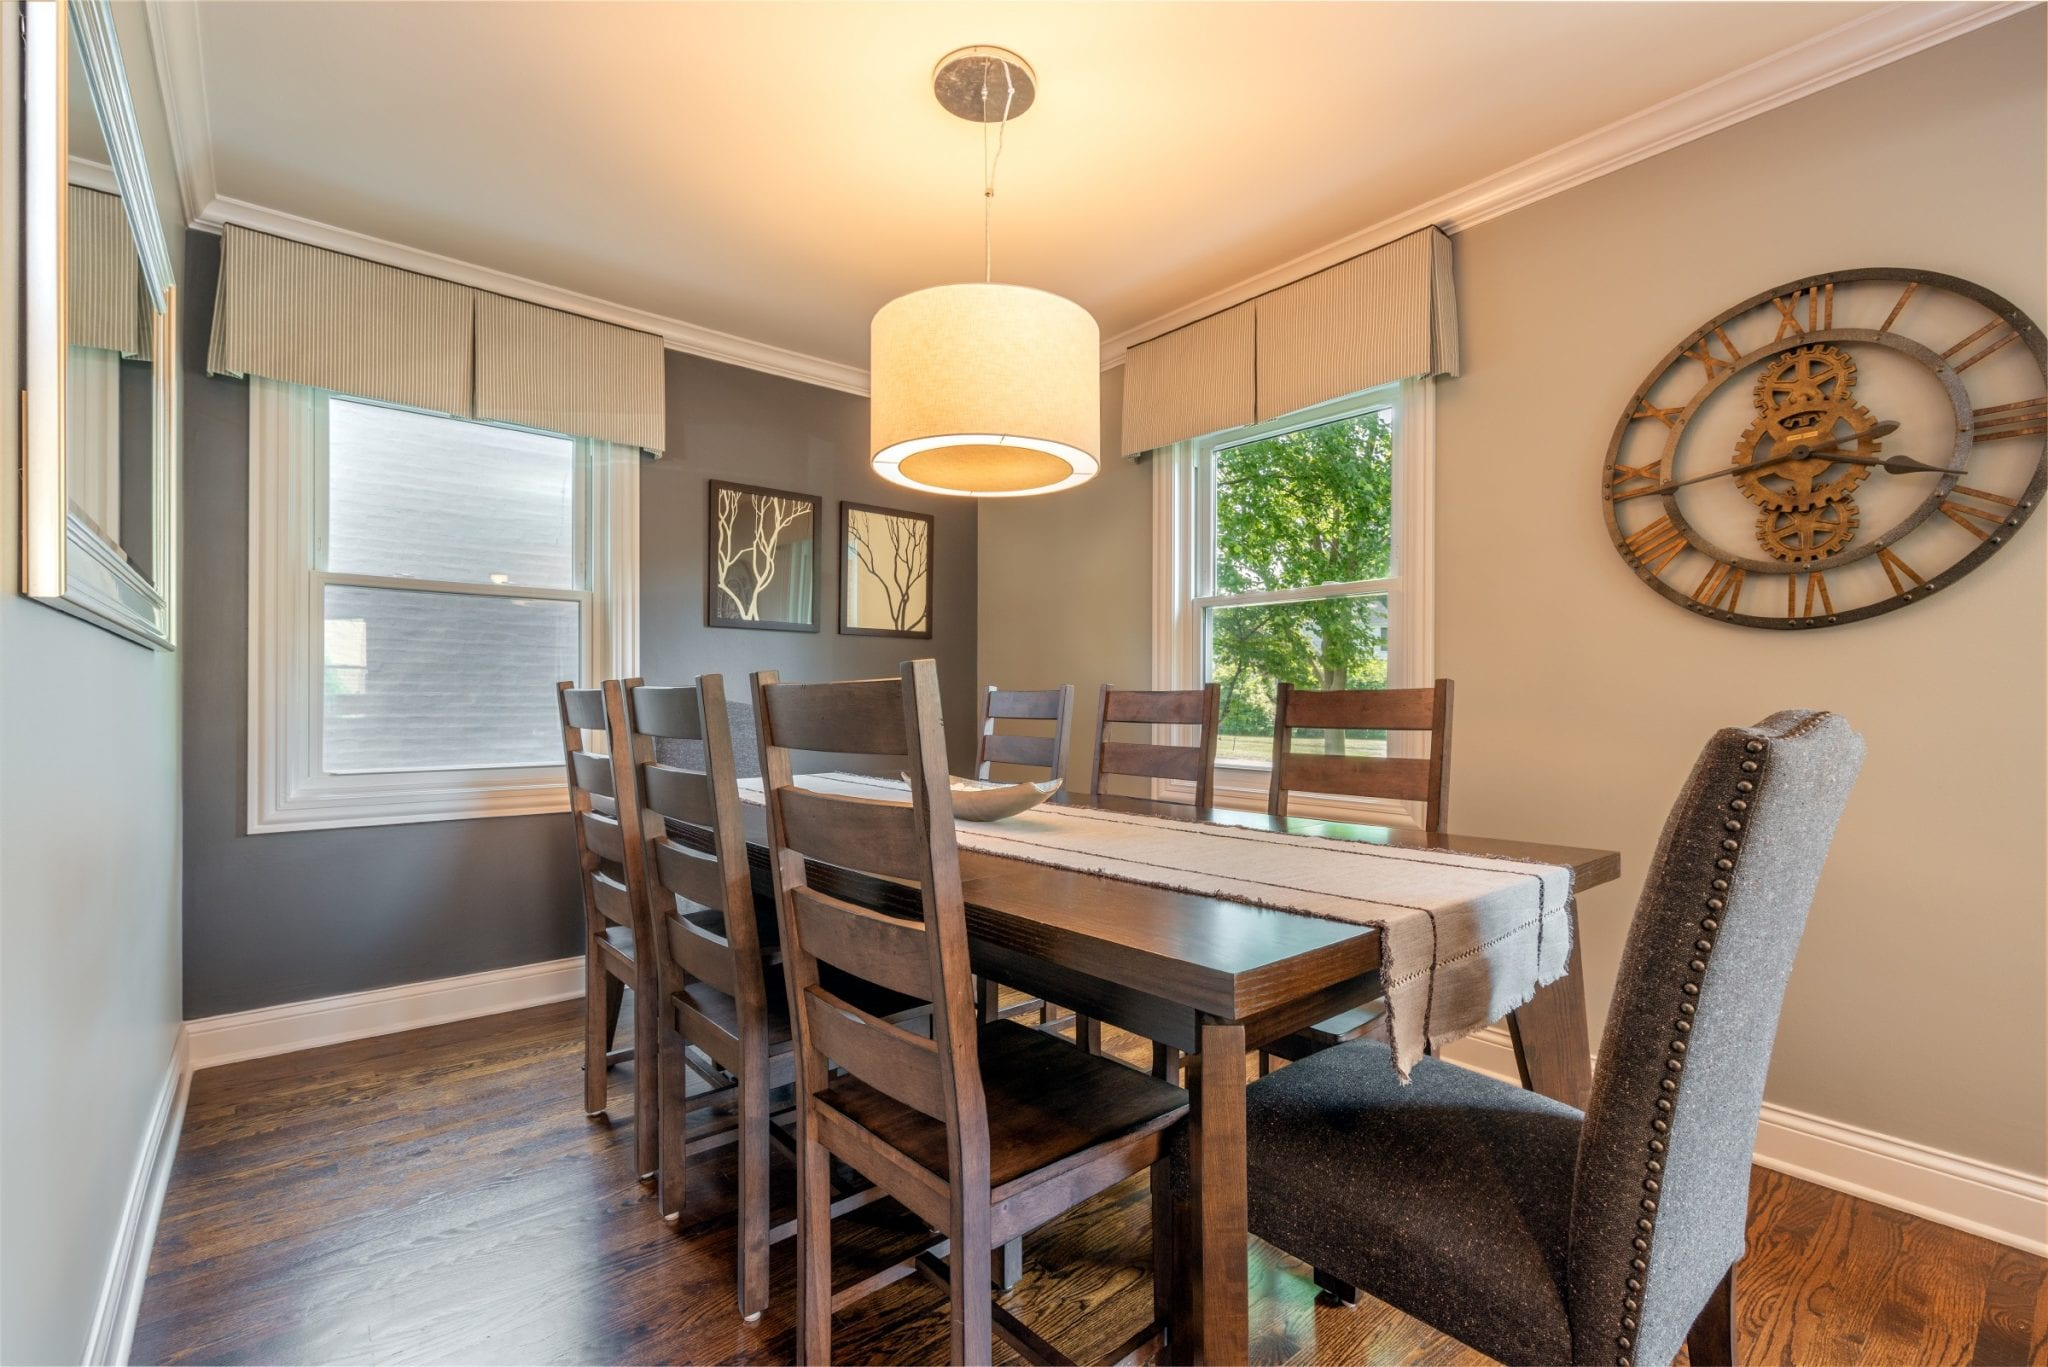 60004 Dining Room Design